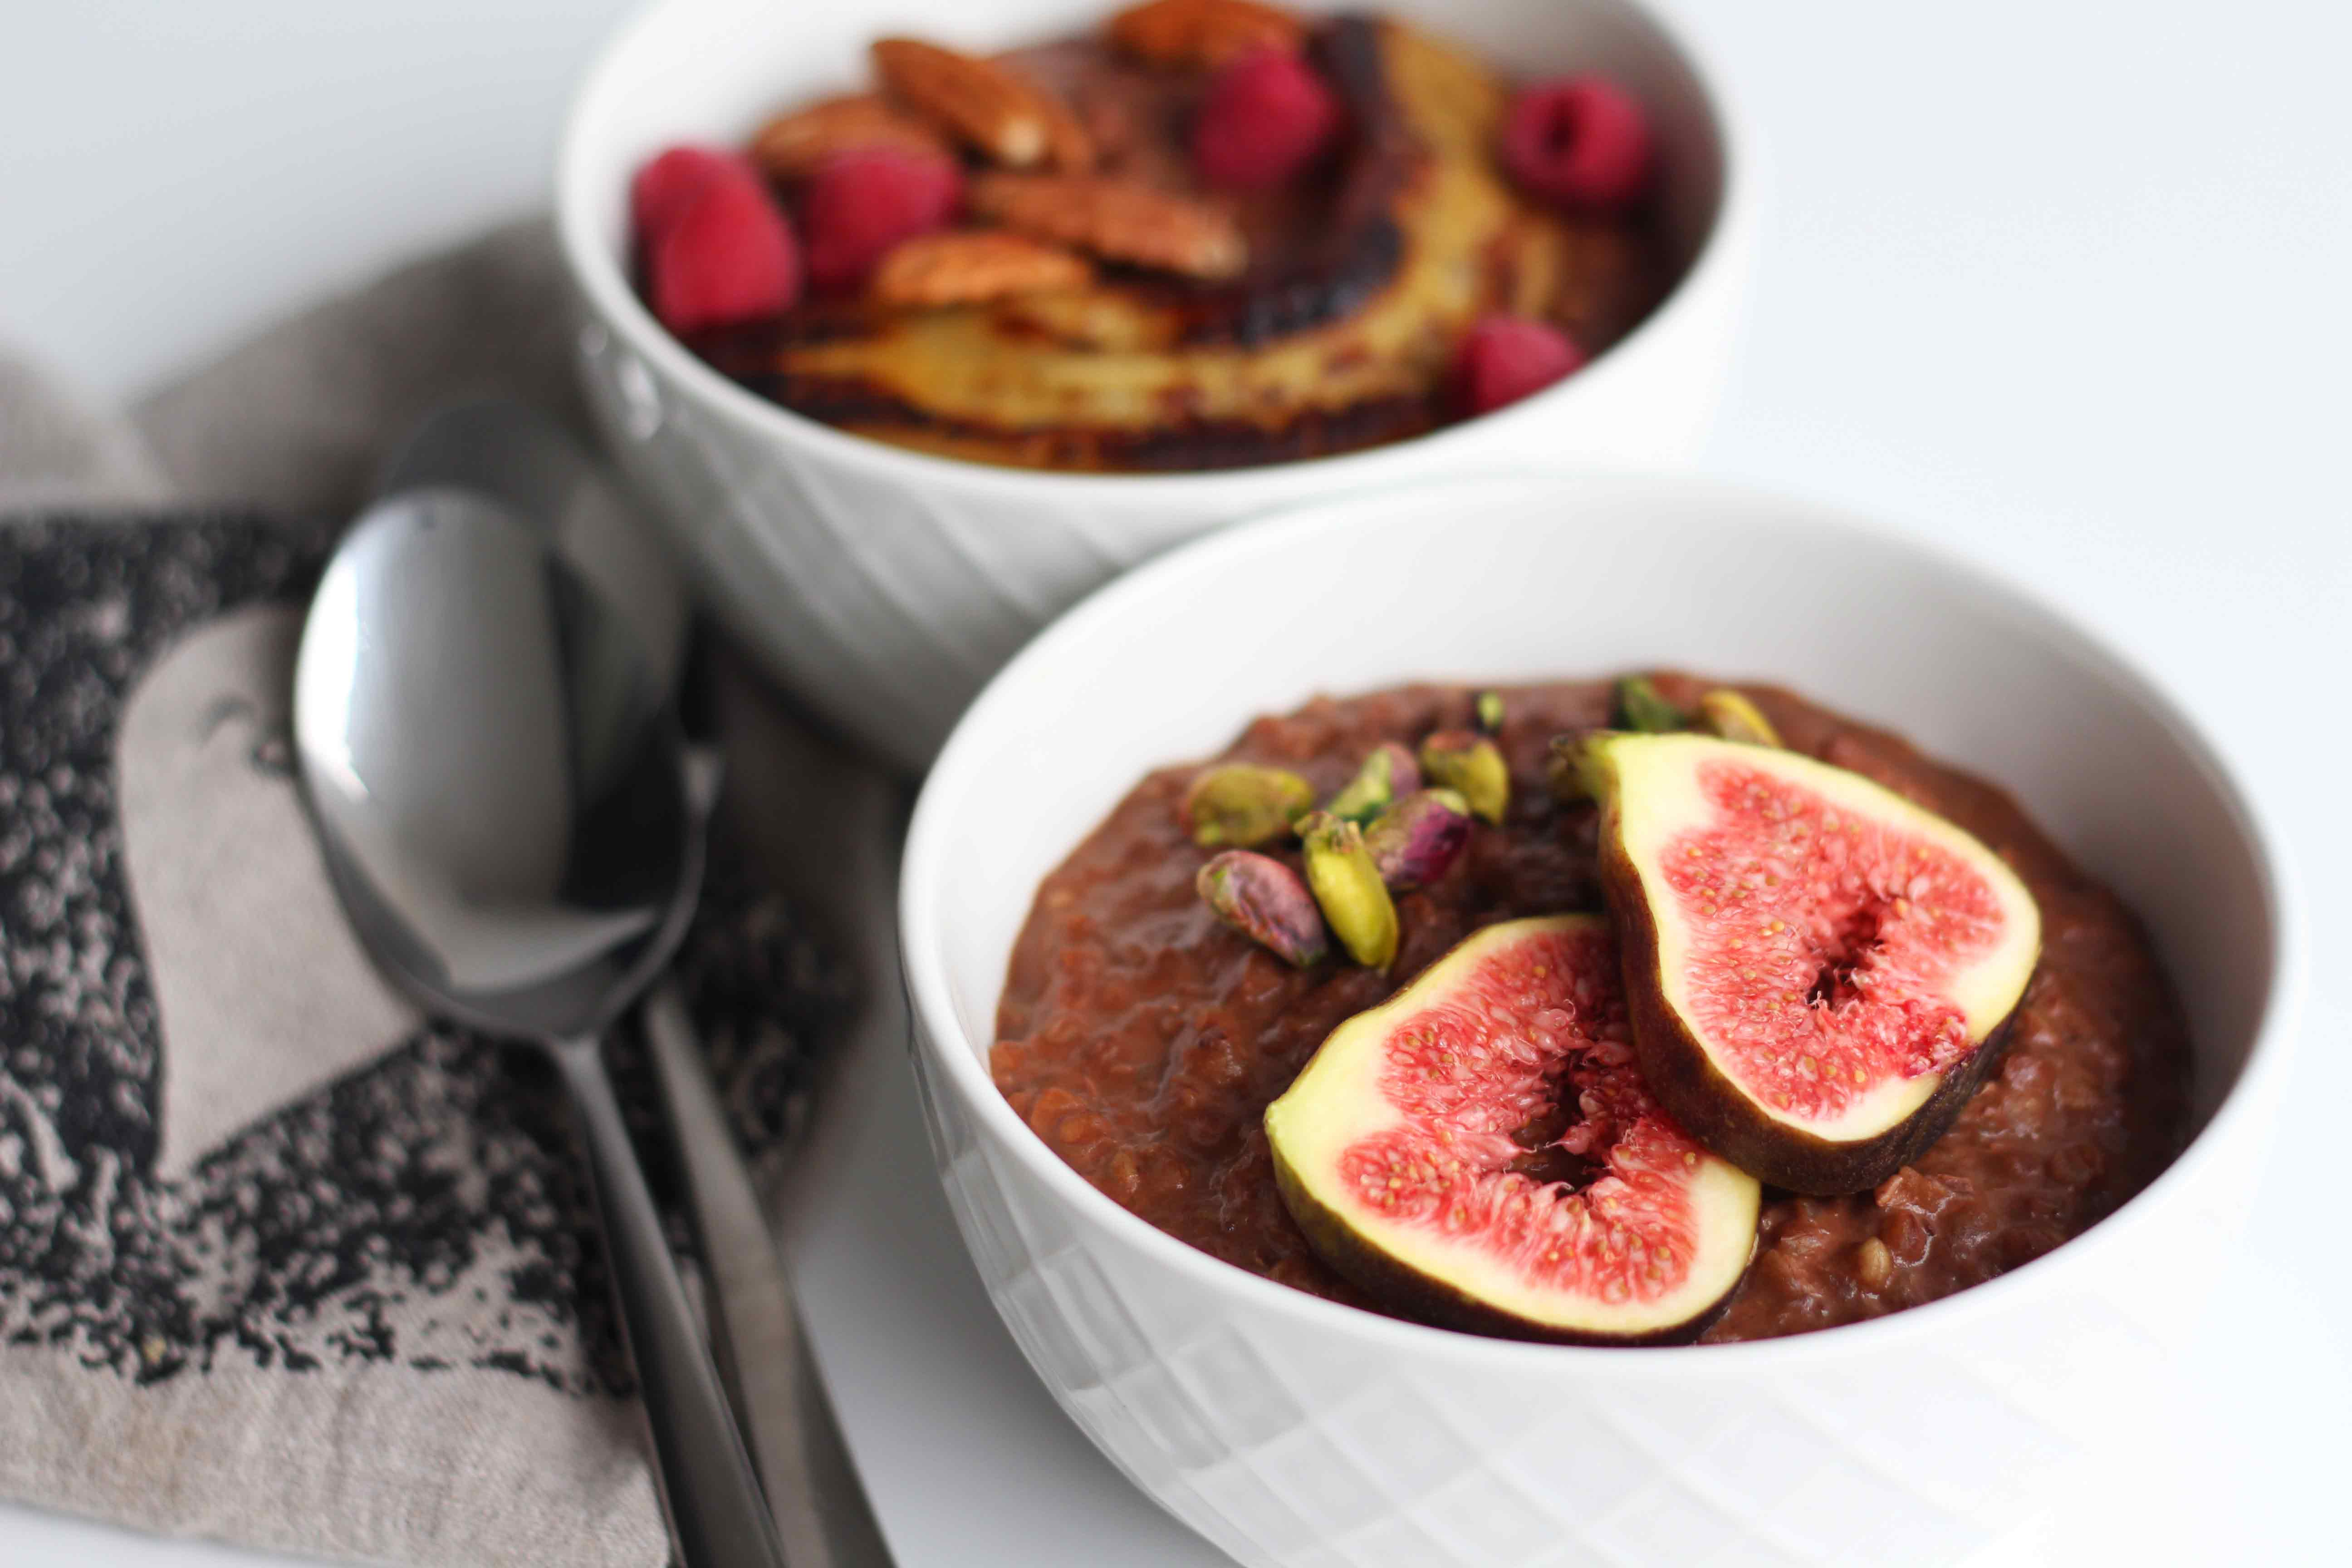 Chocolate Buckwheat Porridge is perfect when you feel like having dessert for breakfast without grabbing something unhealthy.